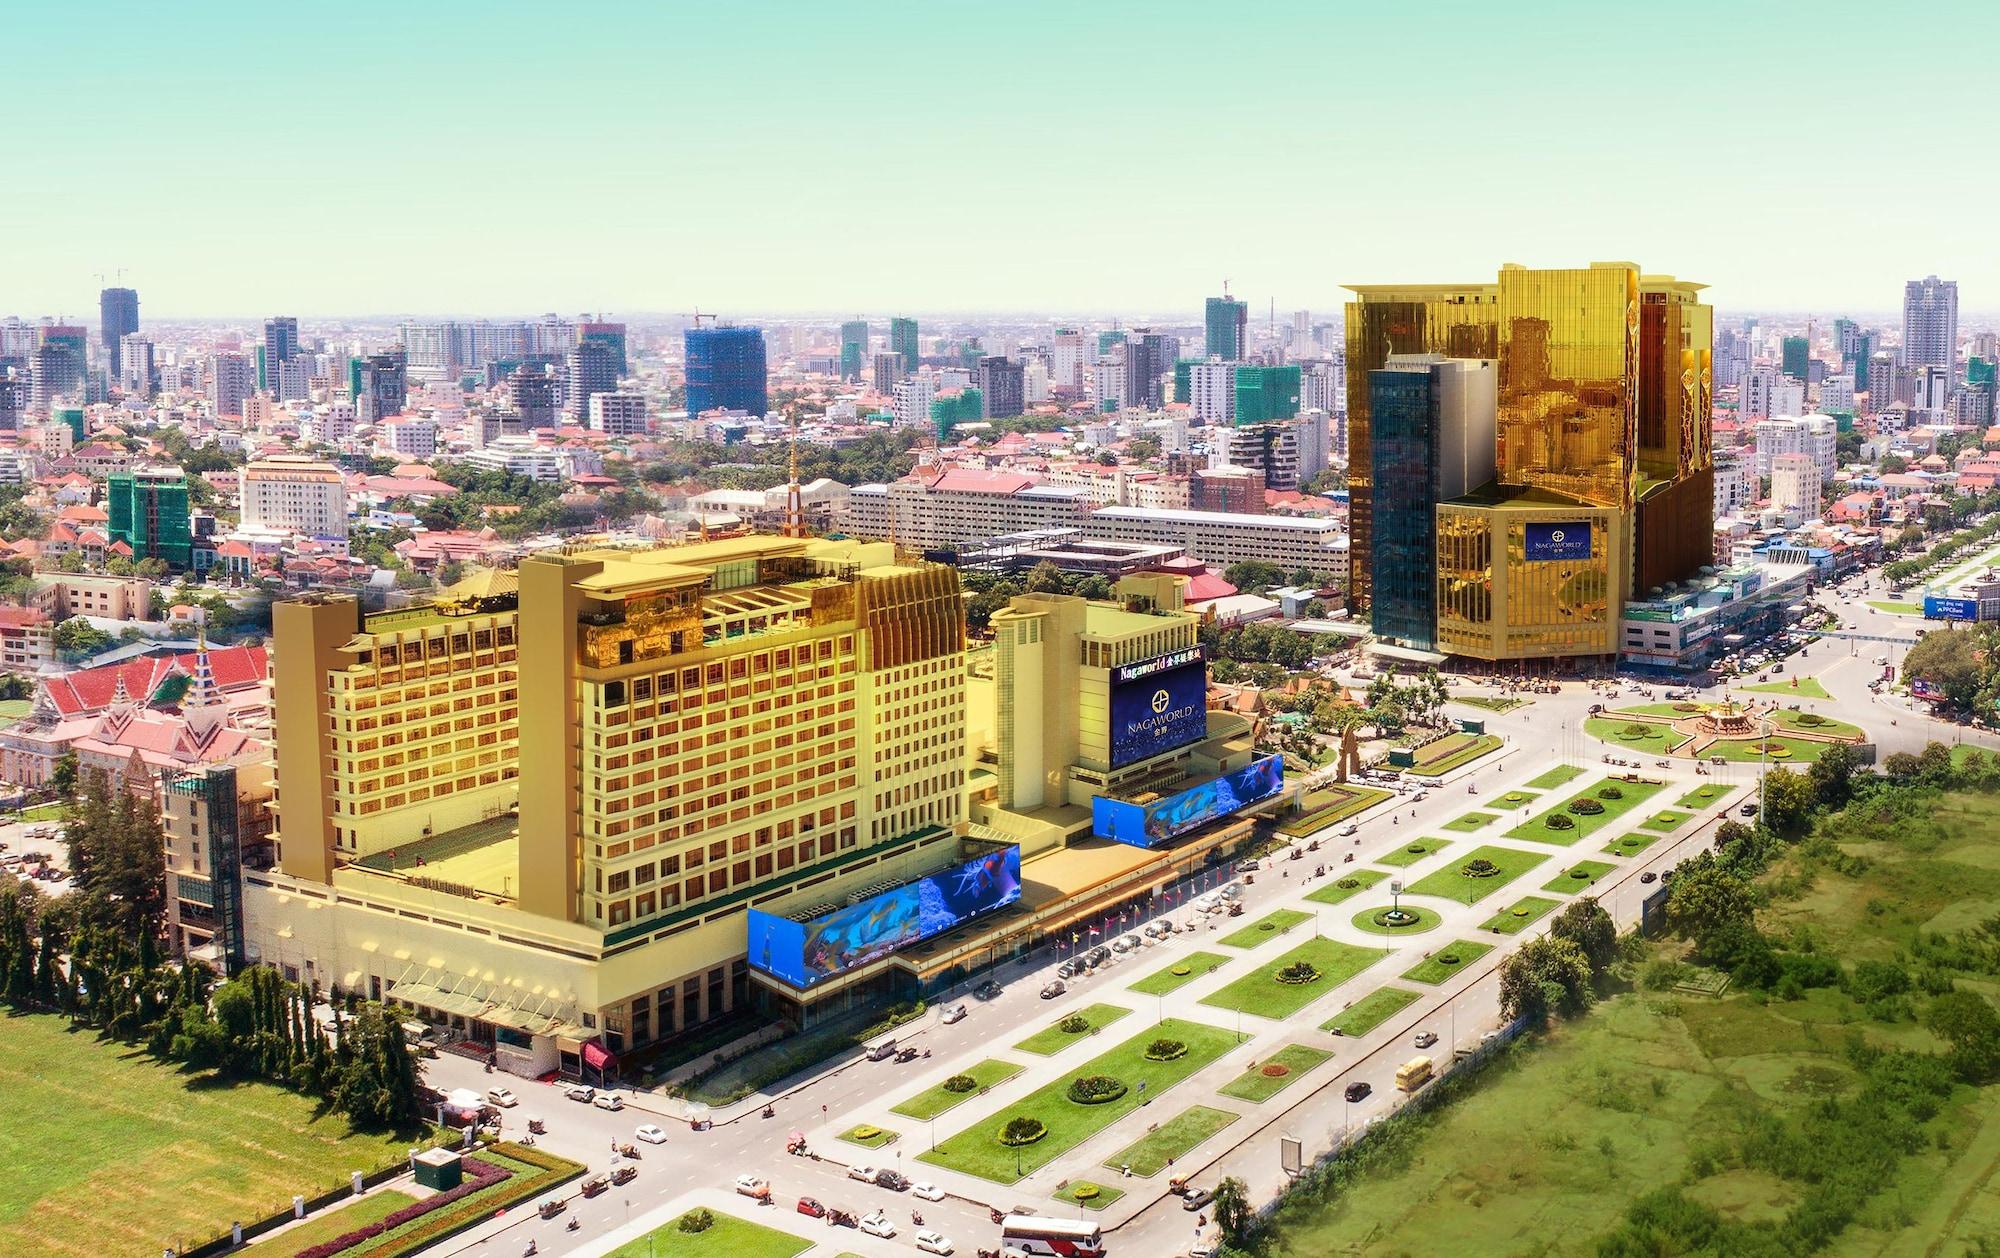 NagaWorld Hotel & Entertainment Complex, Mean Chey